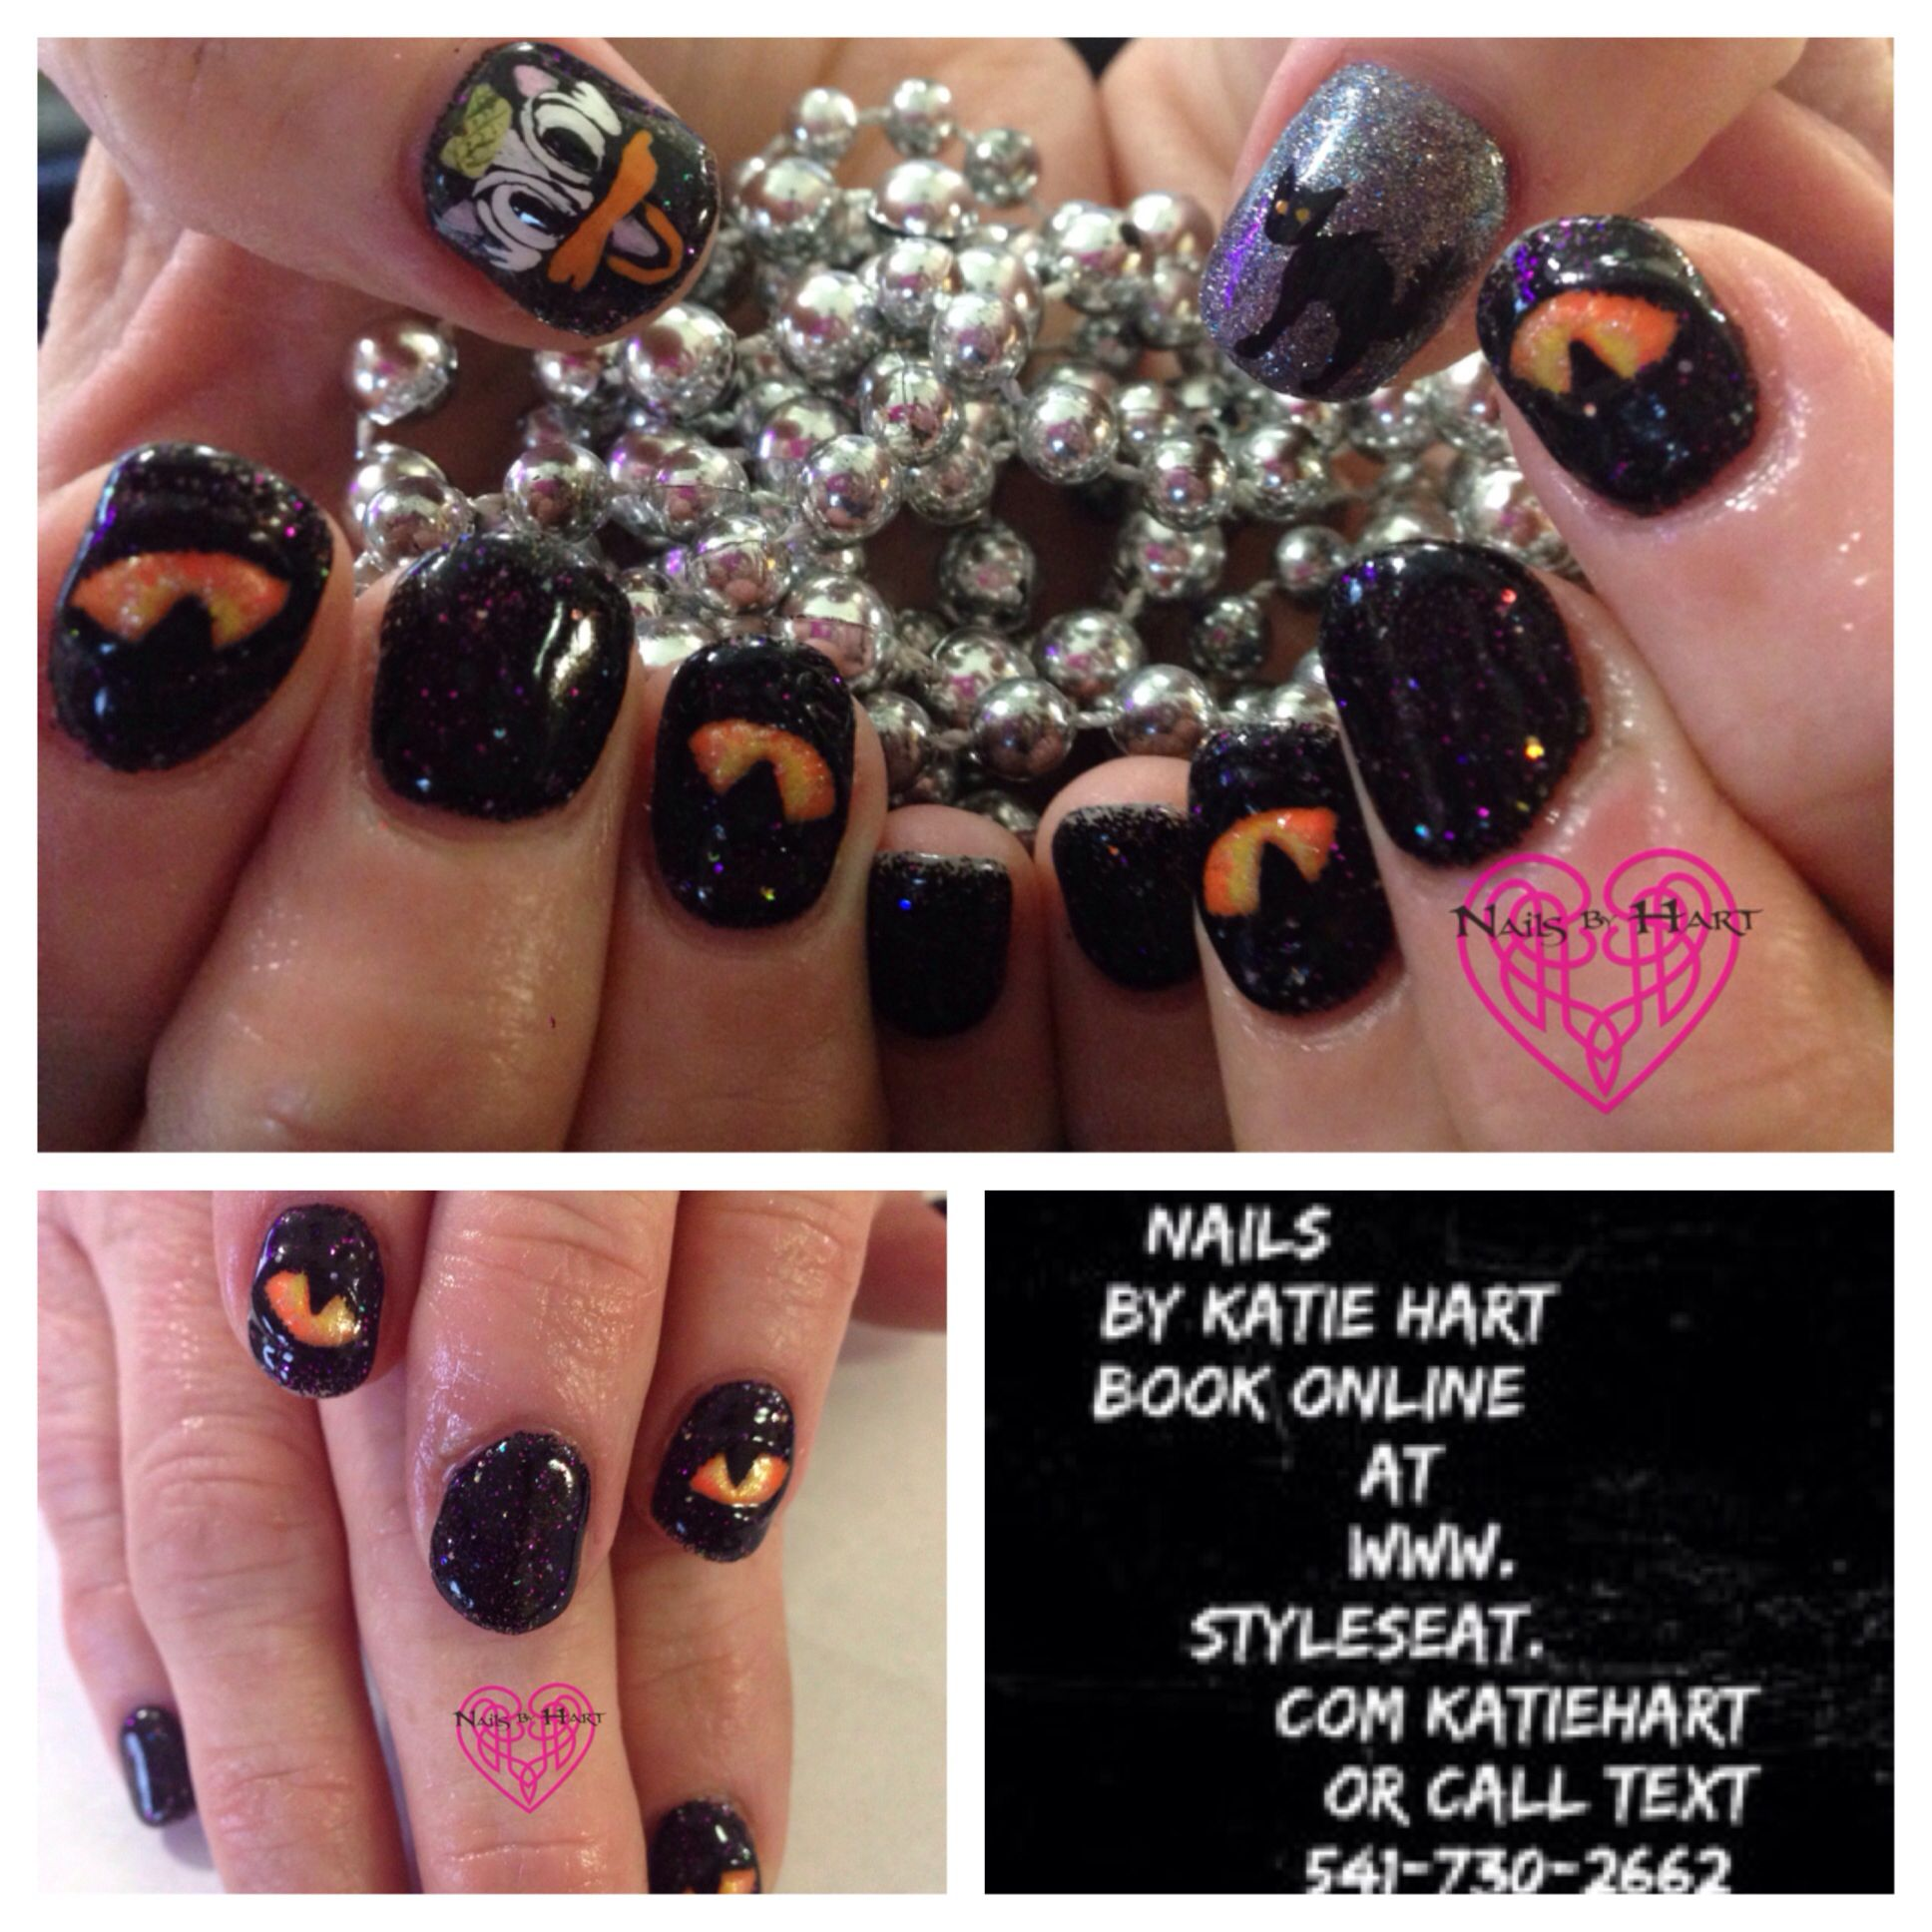 #nailsbyhart #nailsmagazine #nailsmaghalloween # ...